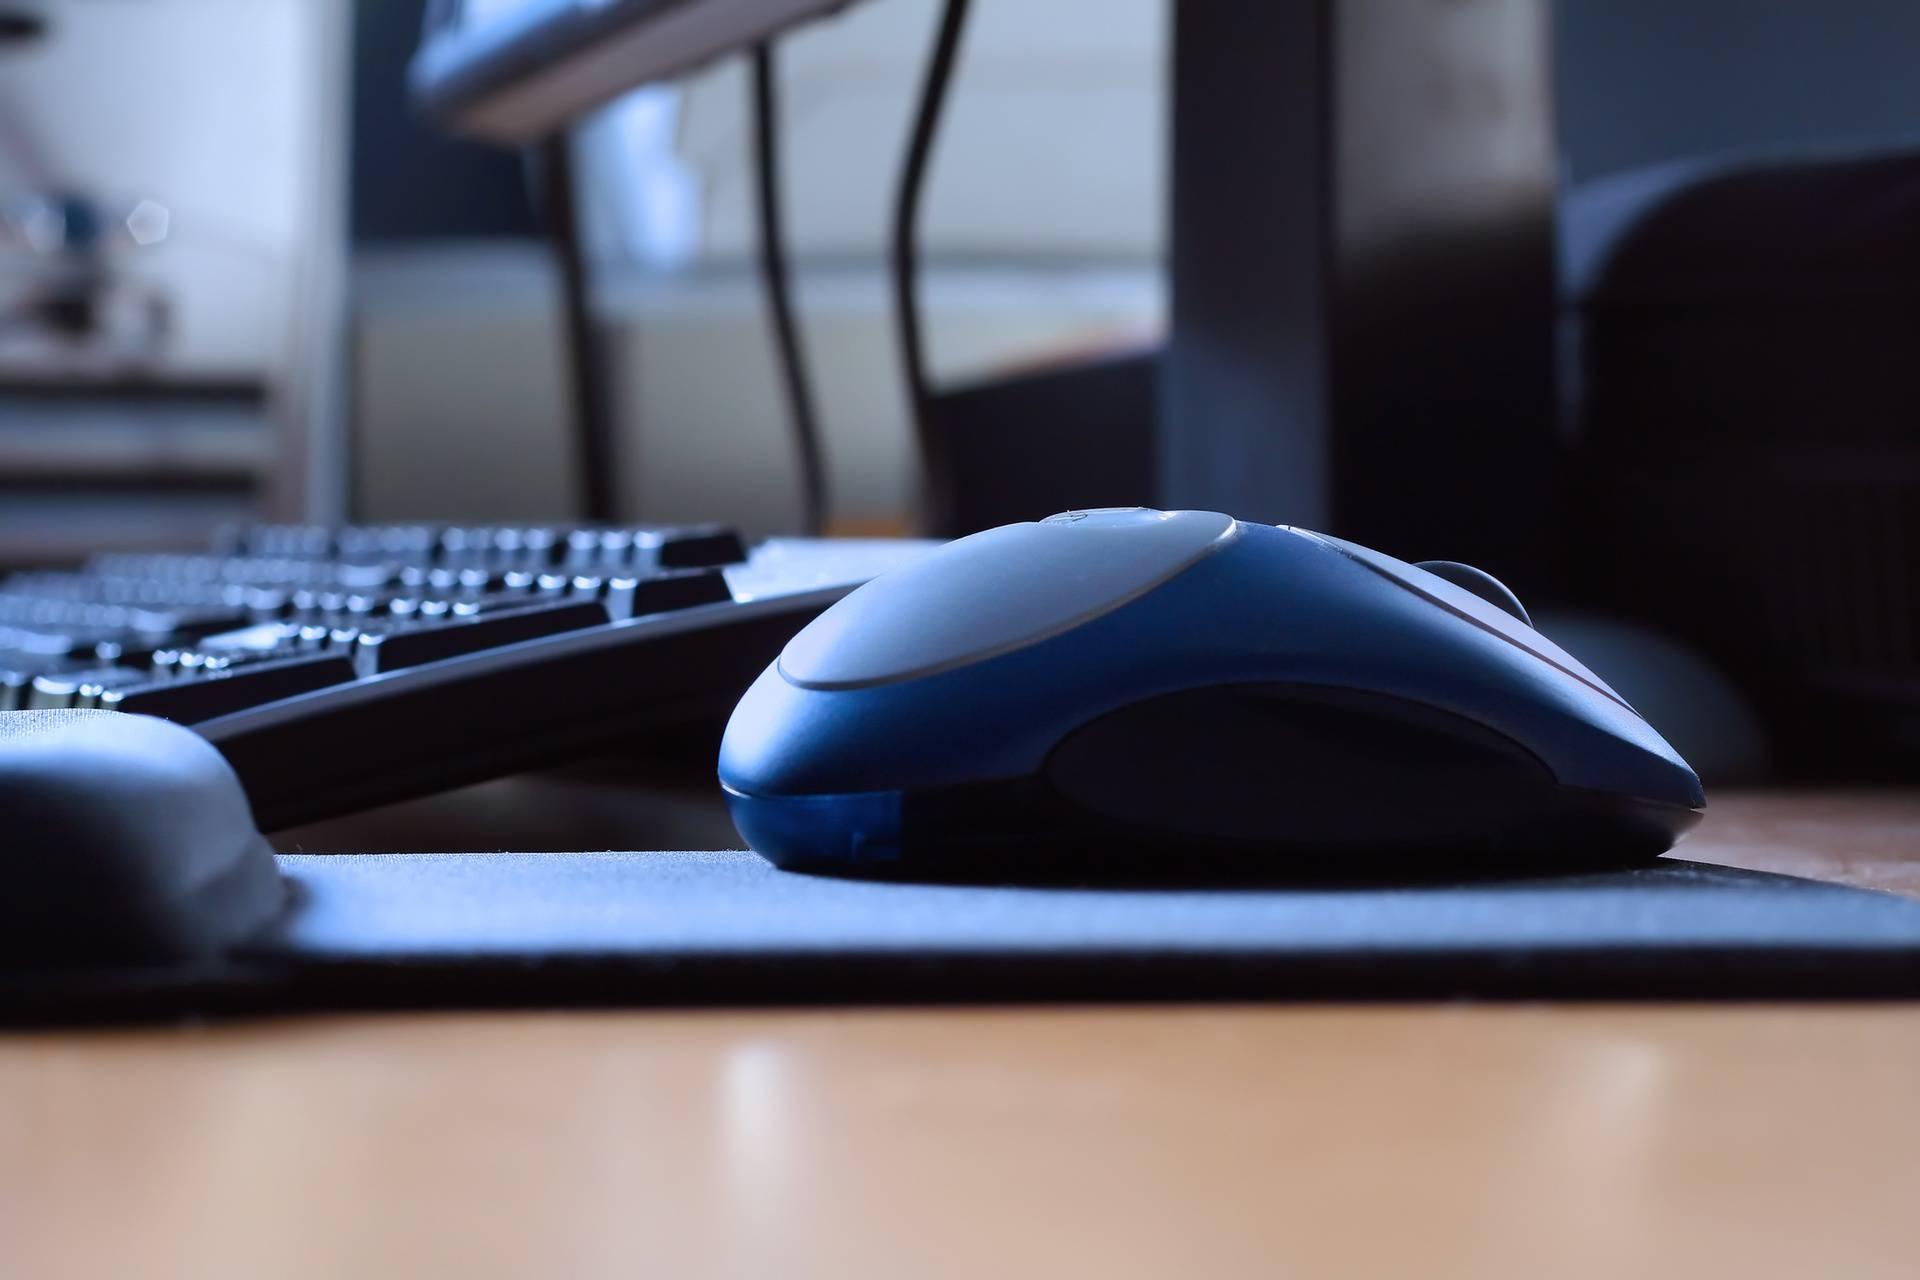 To mnogi zaboravljaju: Kako se pravilno čisti podloga za miša?